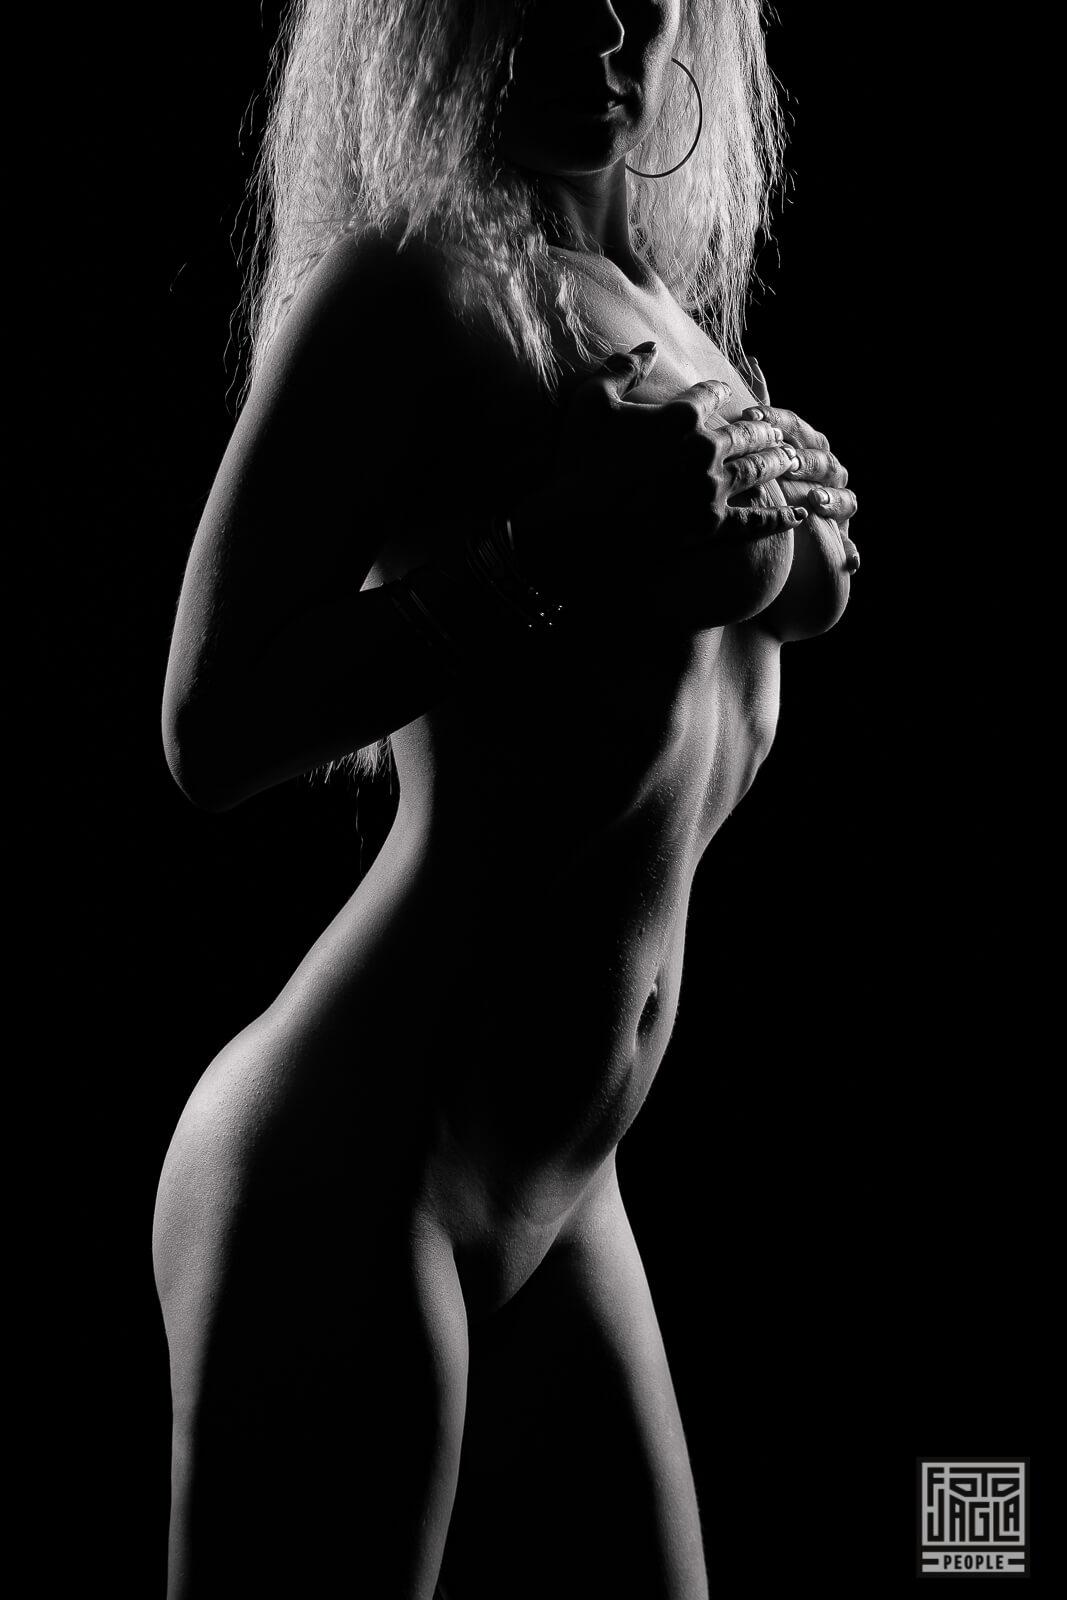 Low Key Akt Fotografie Erotik